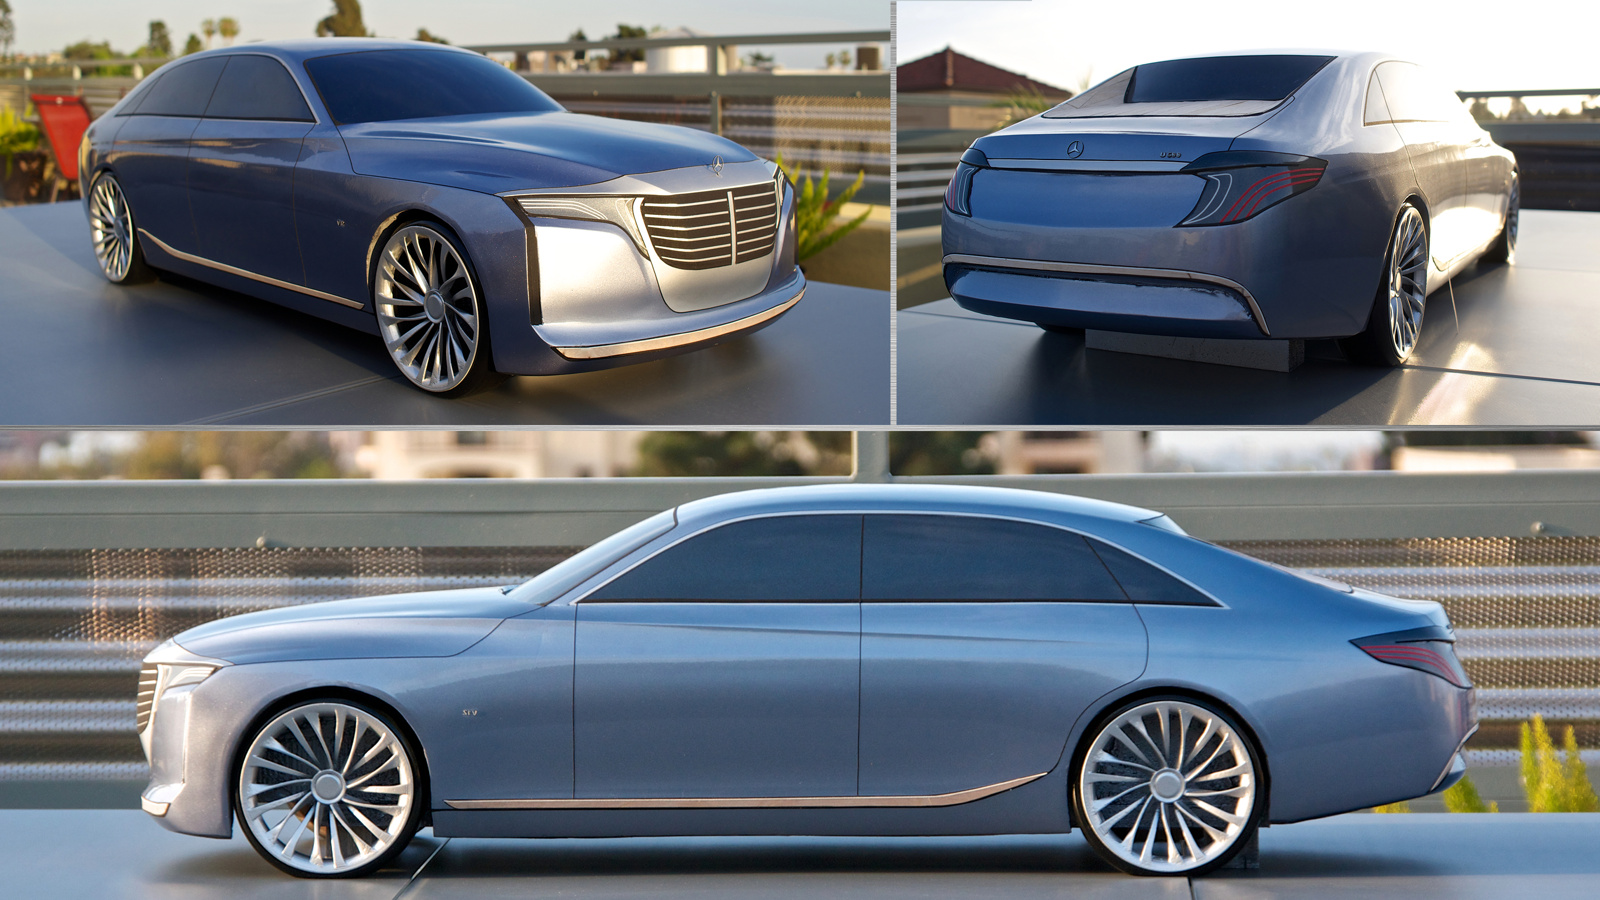 2021 Mercedes Benz U Class Concept Proposed By A Design